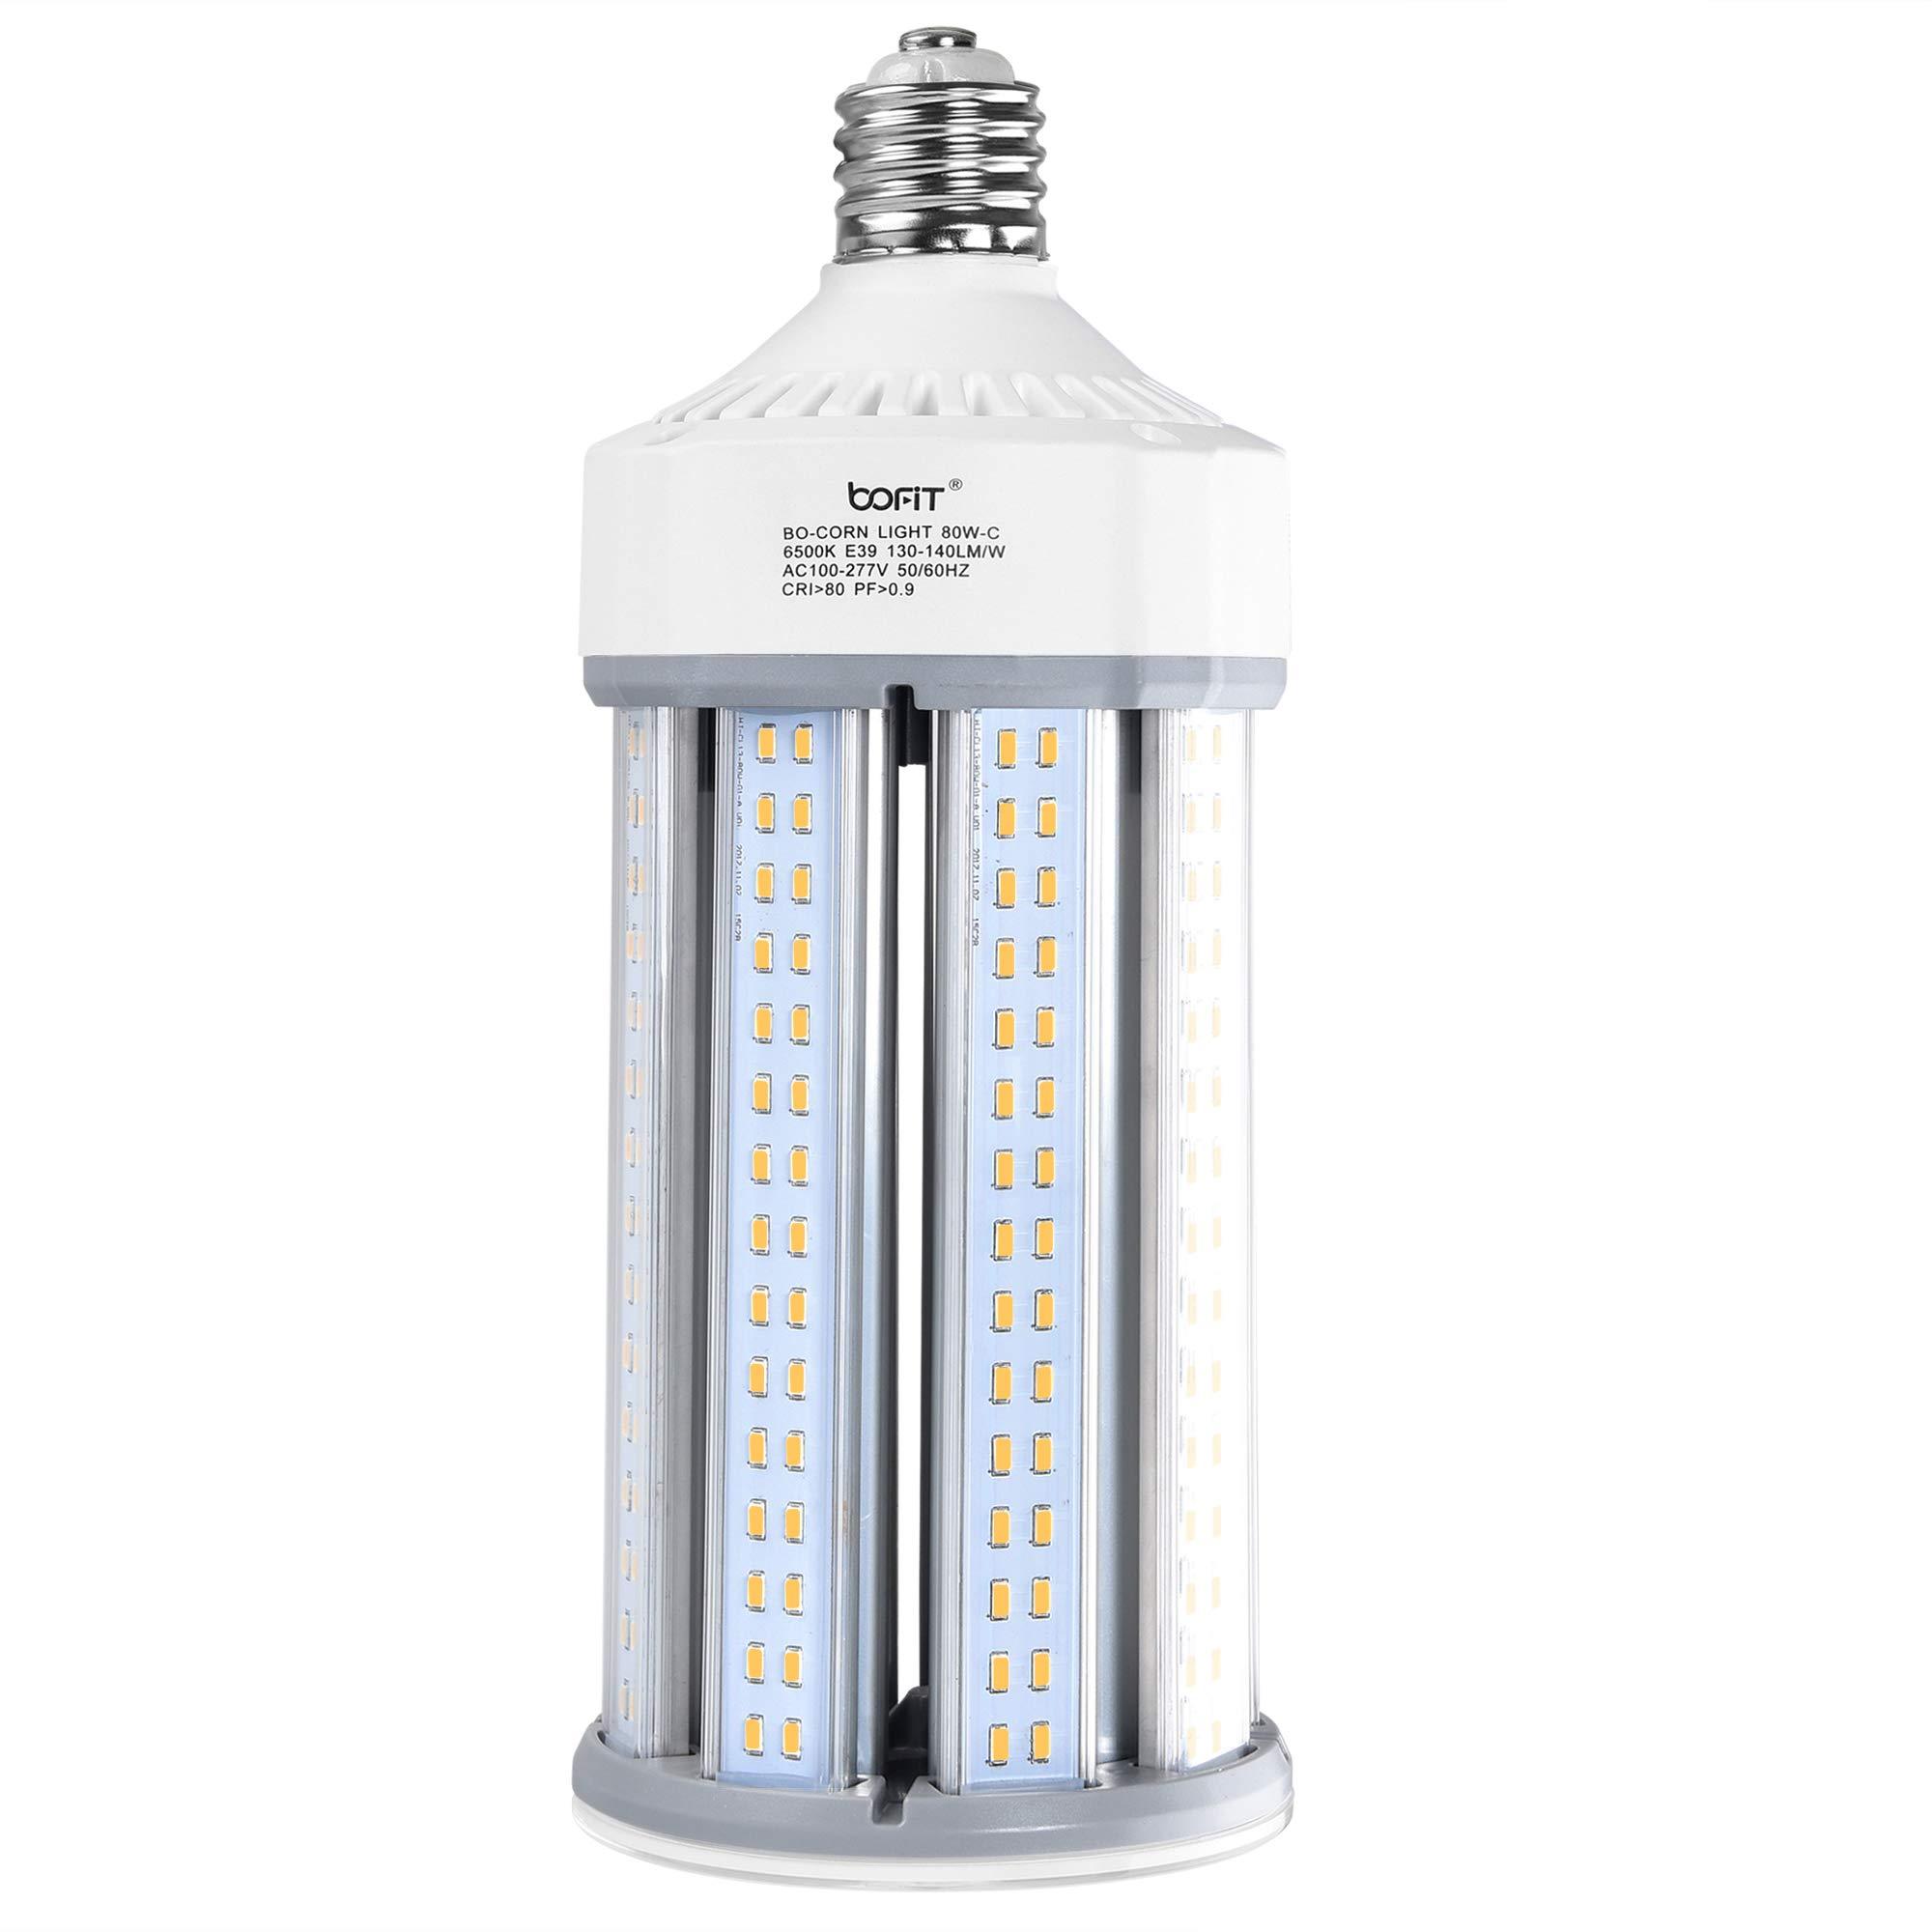 BOFIT 80W LED Corn Bulb, 11200LM (Replace 900W Incandescent Bulbs), 6500K Daylight White Area Light Bulbs, Large Mogul E39 Base, Street Light Bulb, LED Corn Light for Warehouse Garage Parking Lot